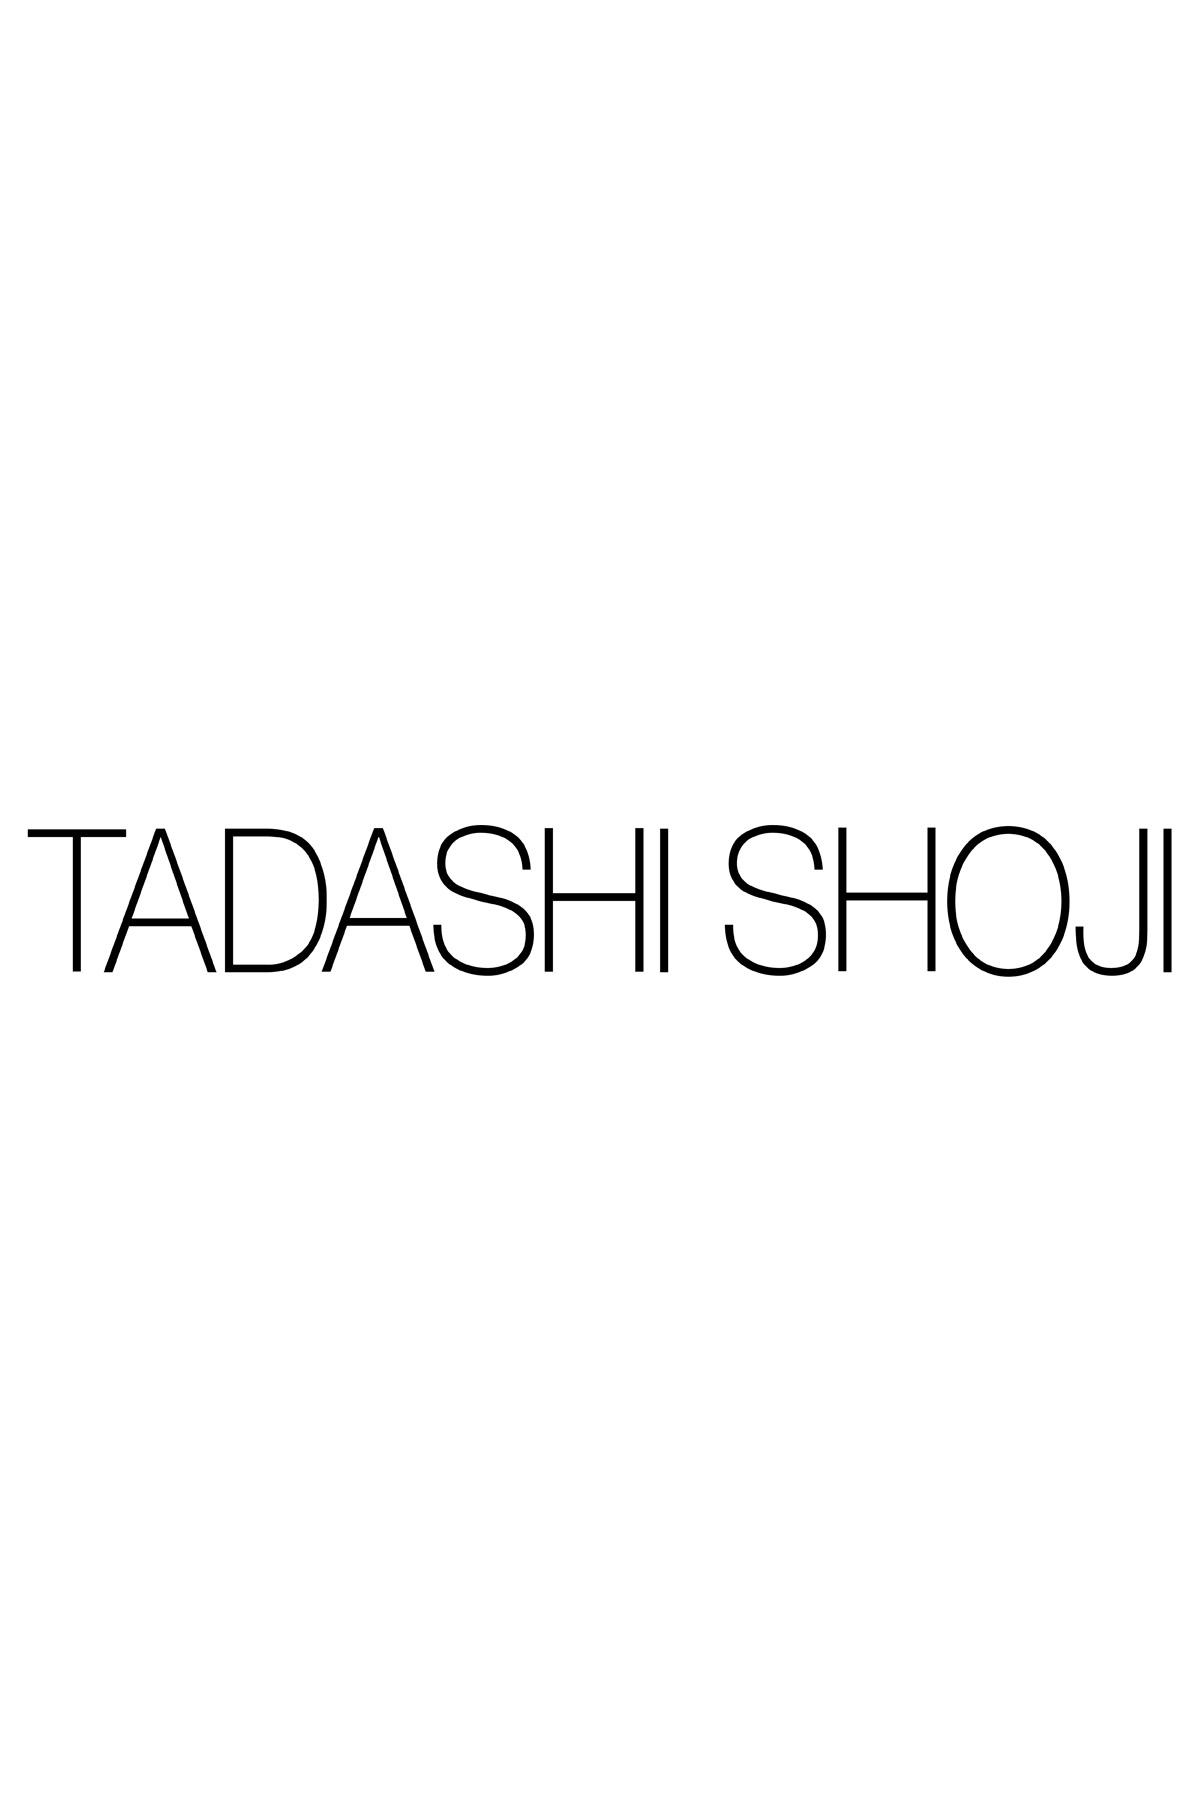 ... Tadashi Shoji - Emeline Floral Appliqué Gown f93e96c1c